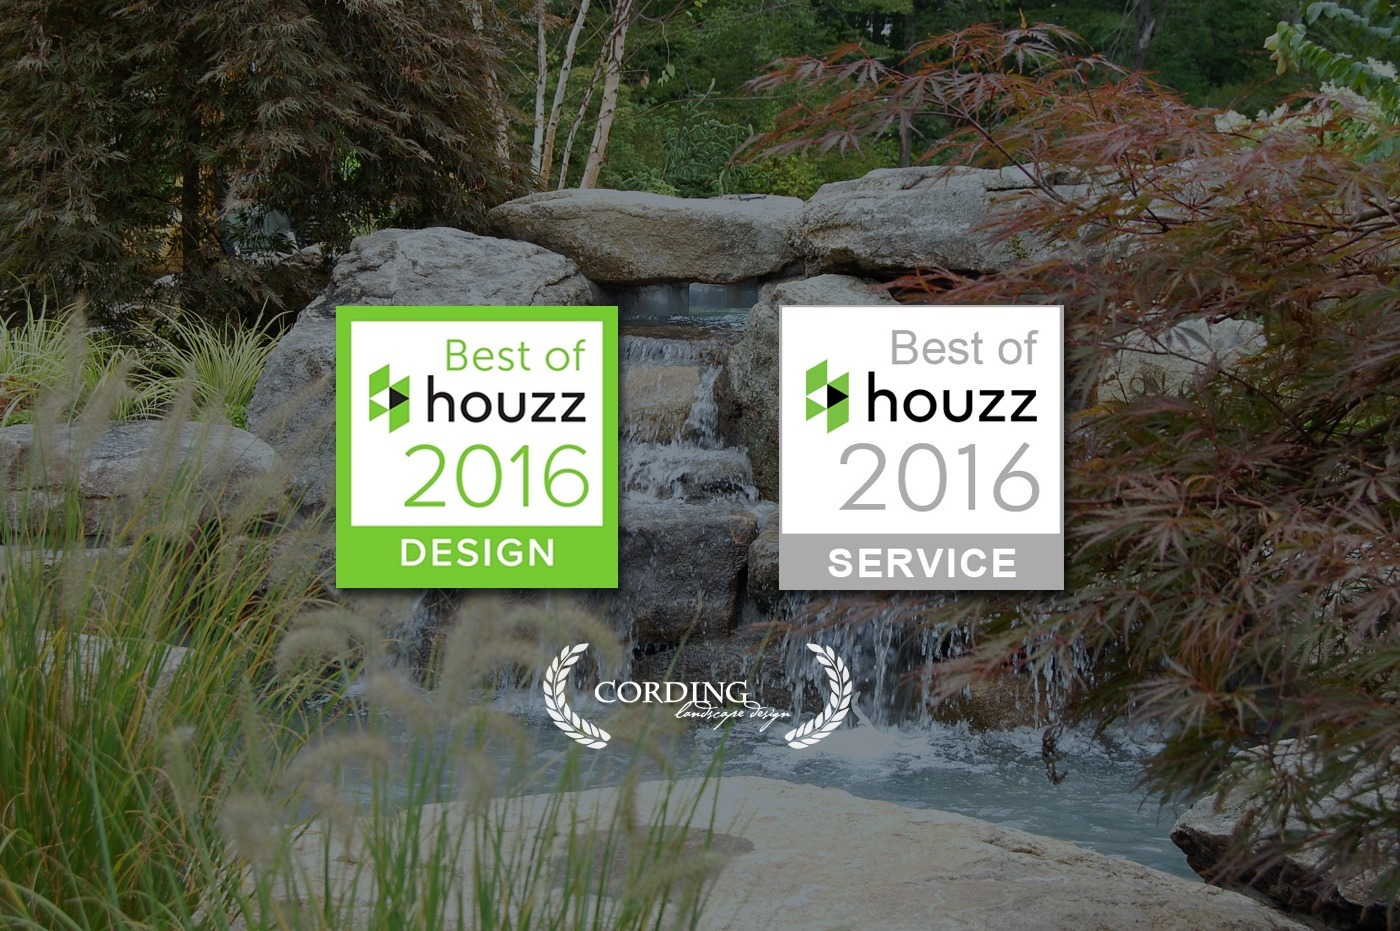 cording landscape design - new jersey - best of houzz 2016